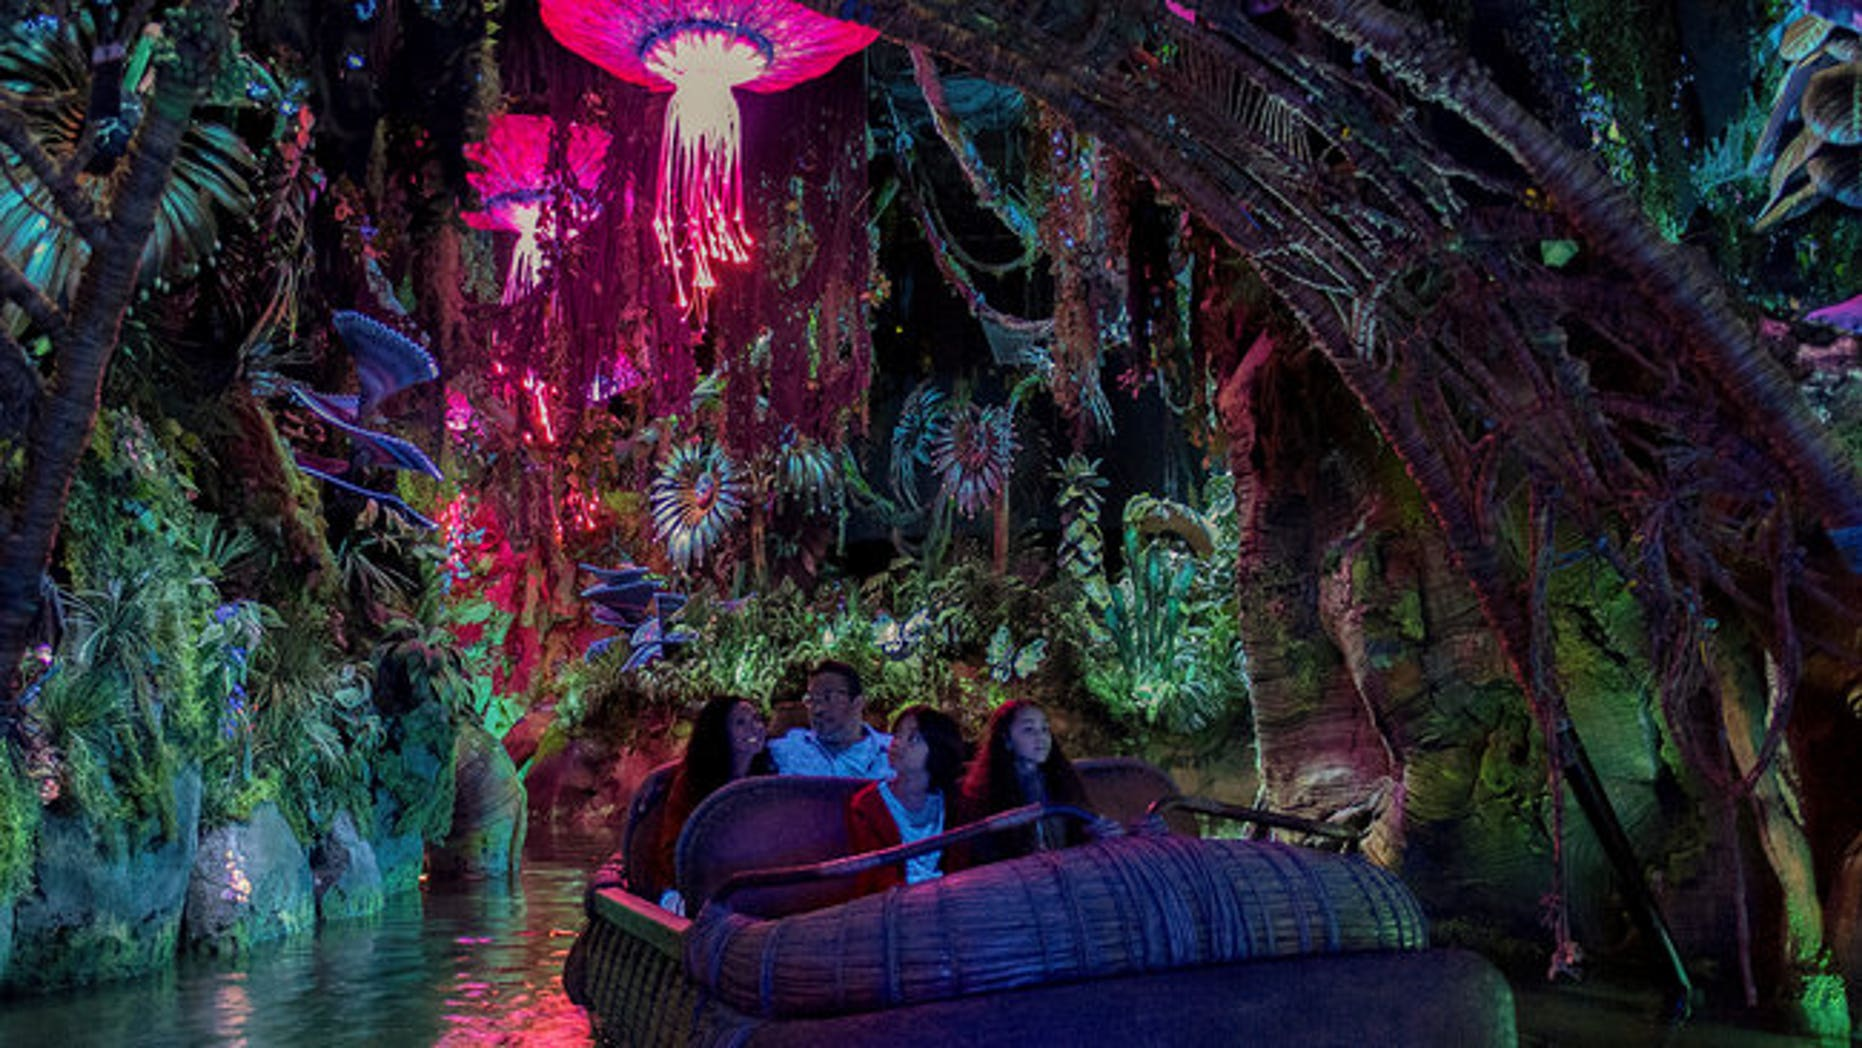 The Na'vi River Journey is coming to Disney's Animal Kingdom in Orlando, Fla.